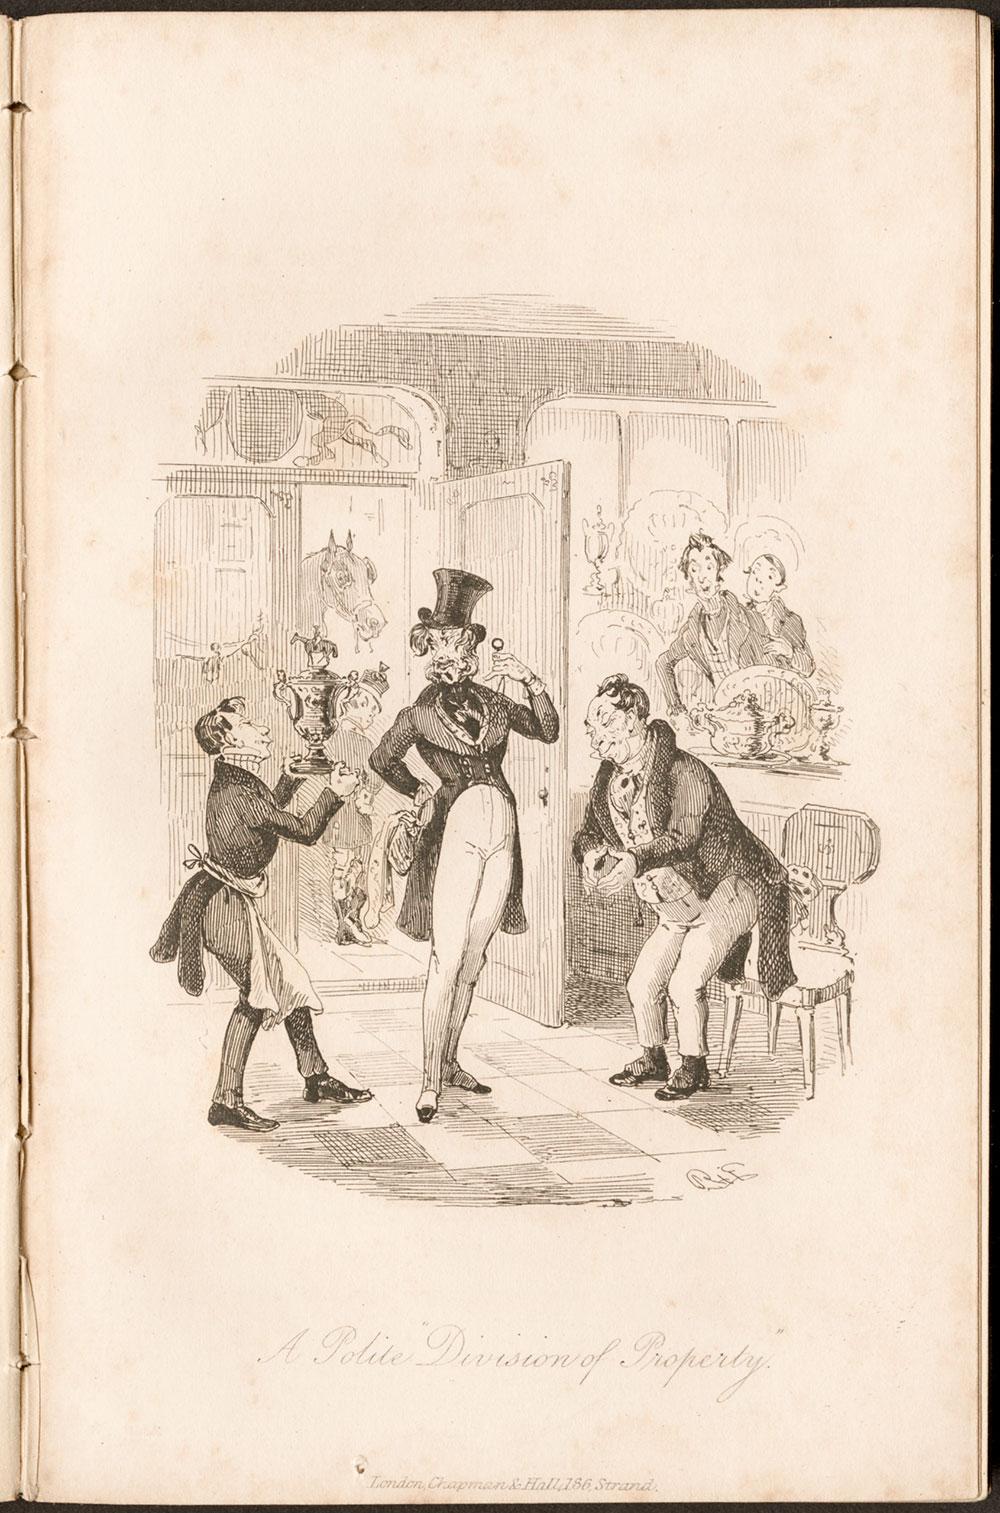 Douglas William Jerrold. The Handbook of Swindling. London: Chapman and Hall, 1839.